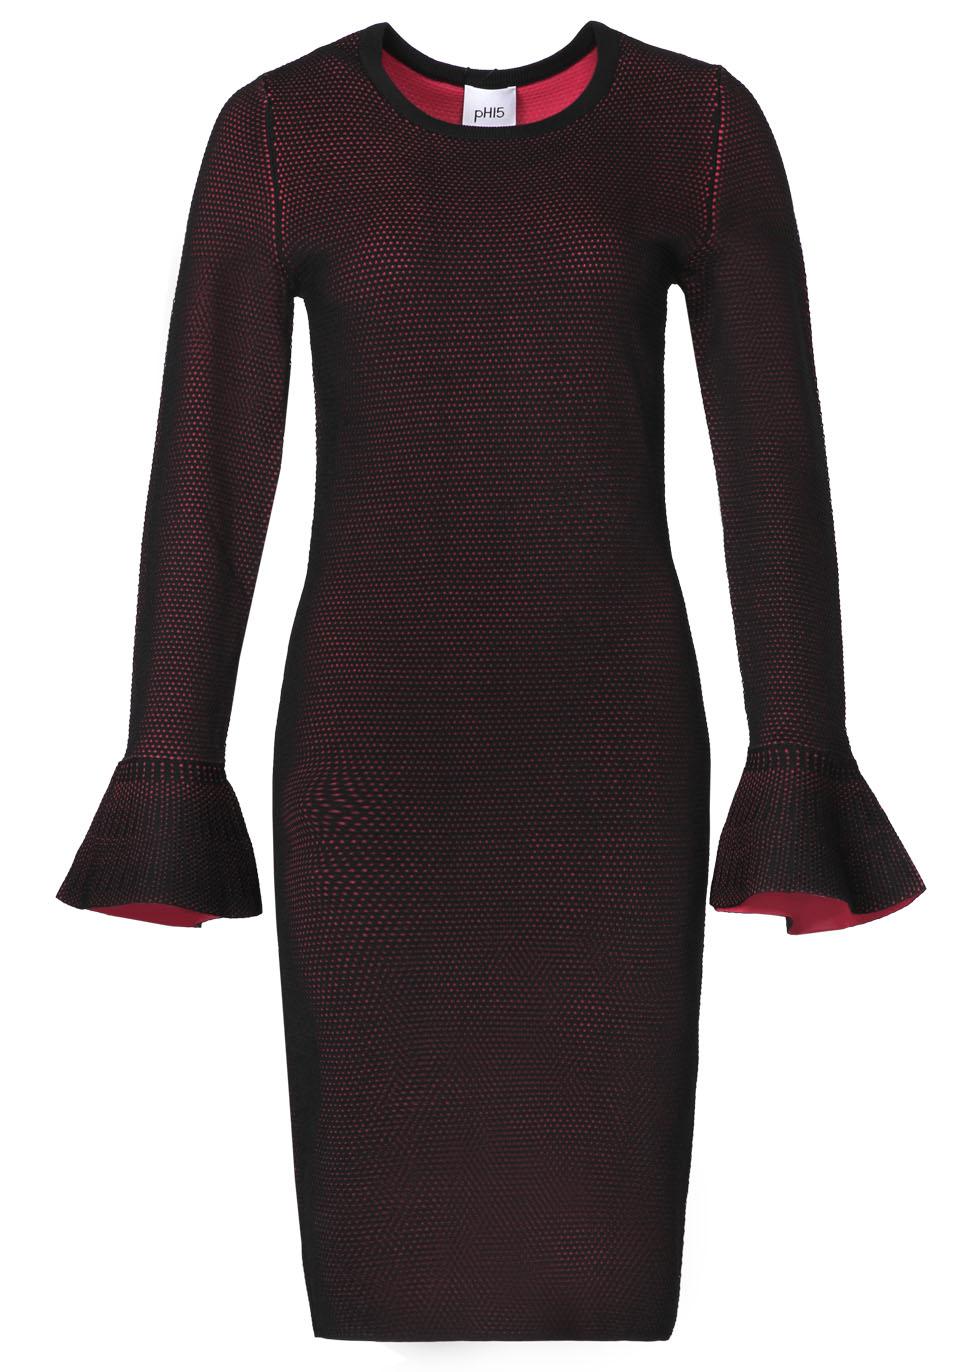 Long Sleeve Knit Dress With Ruffle Cuff-image.jpg